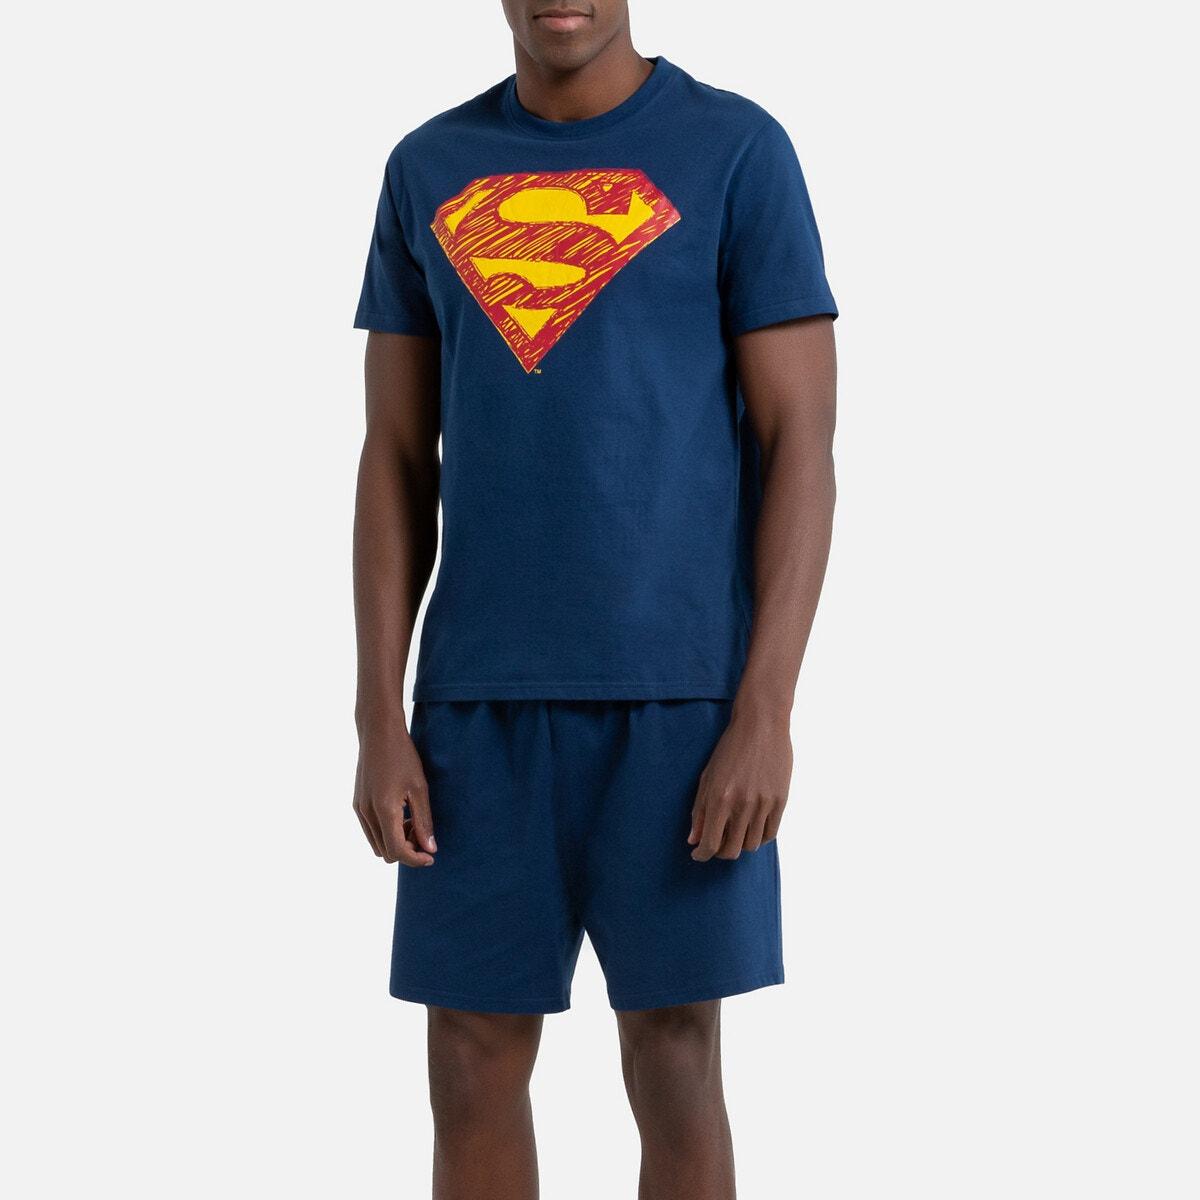 Superman - Πιτζάμα με σορτς Superman 350183879 - 1629